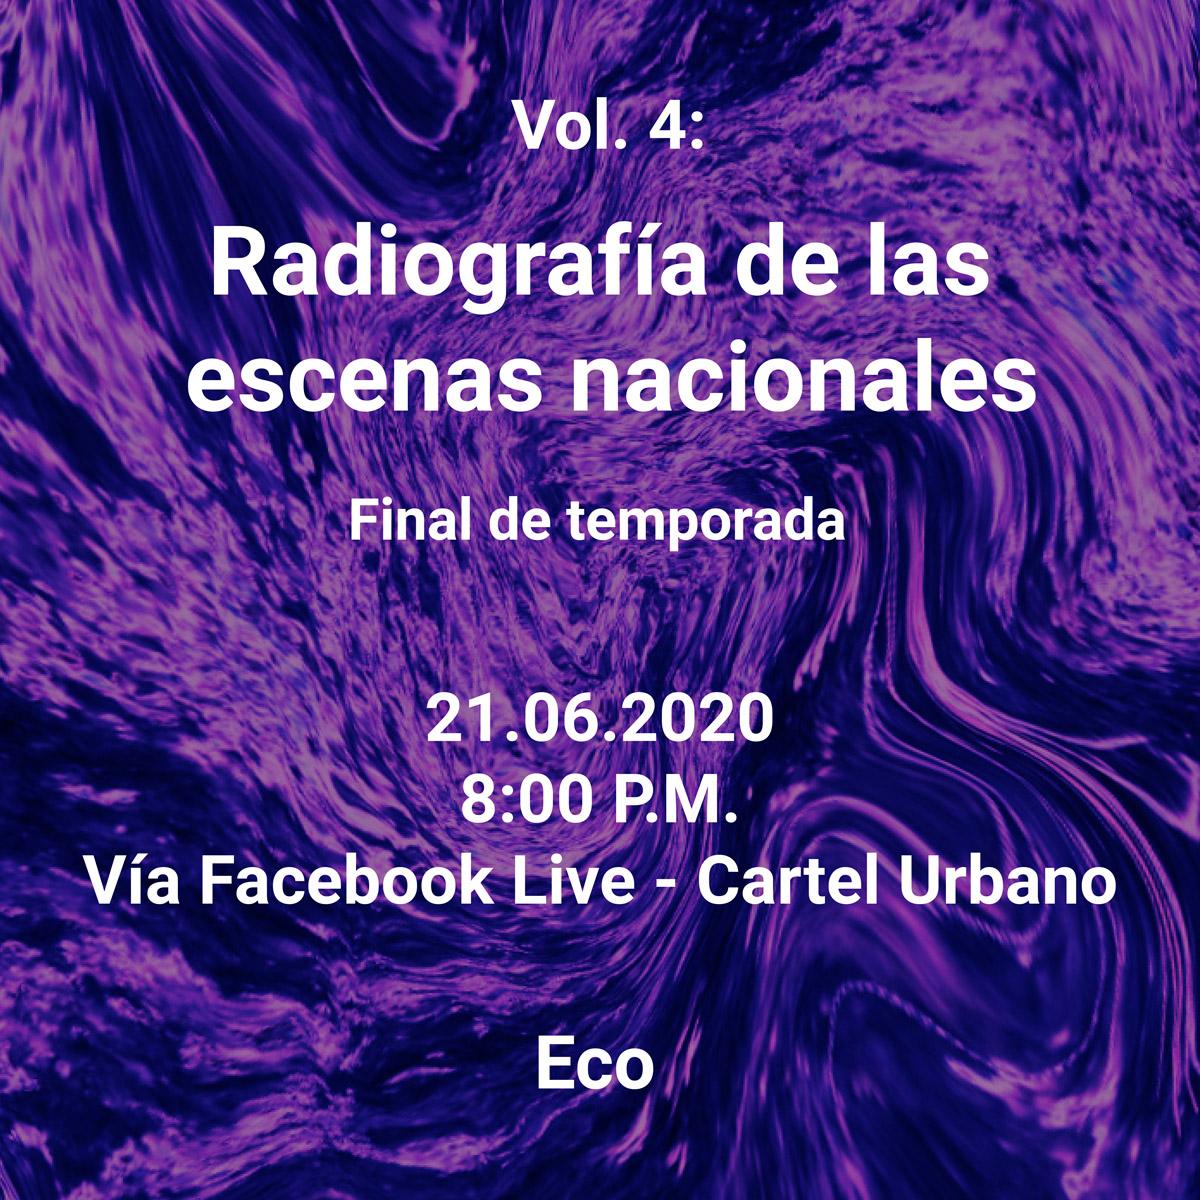 eco-02.jpg